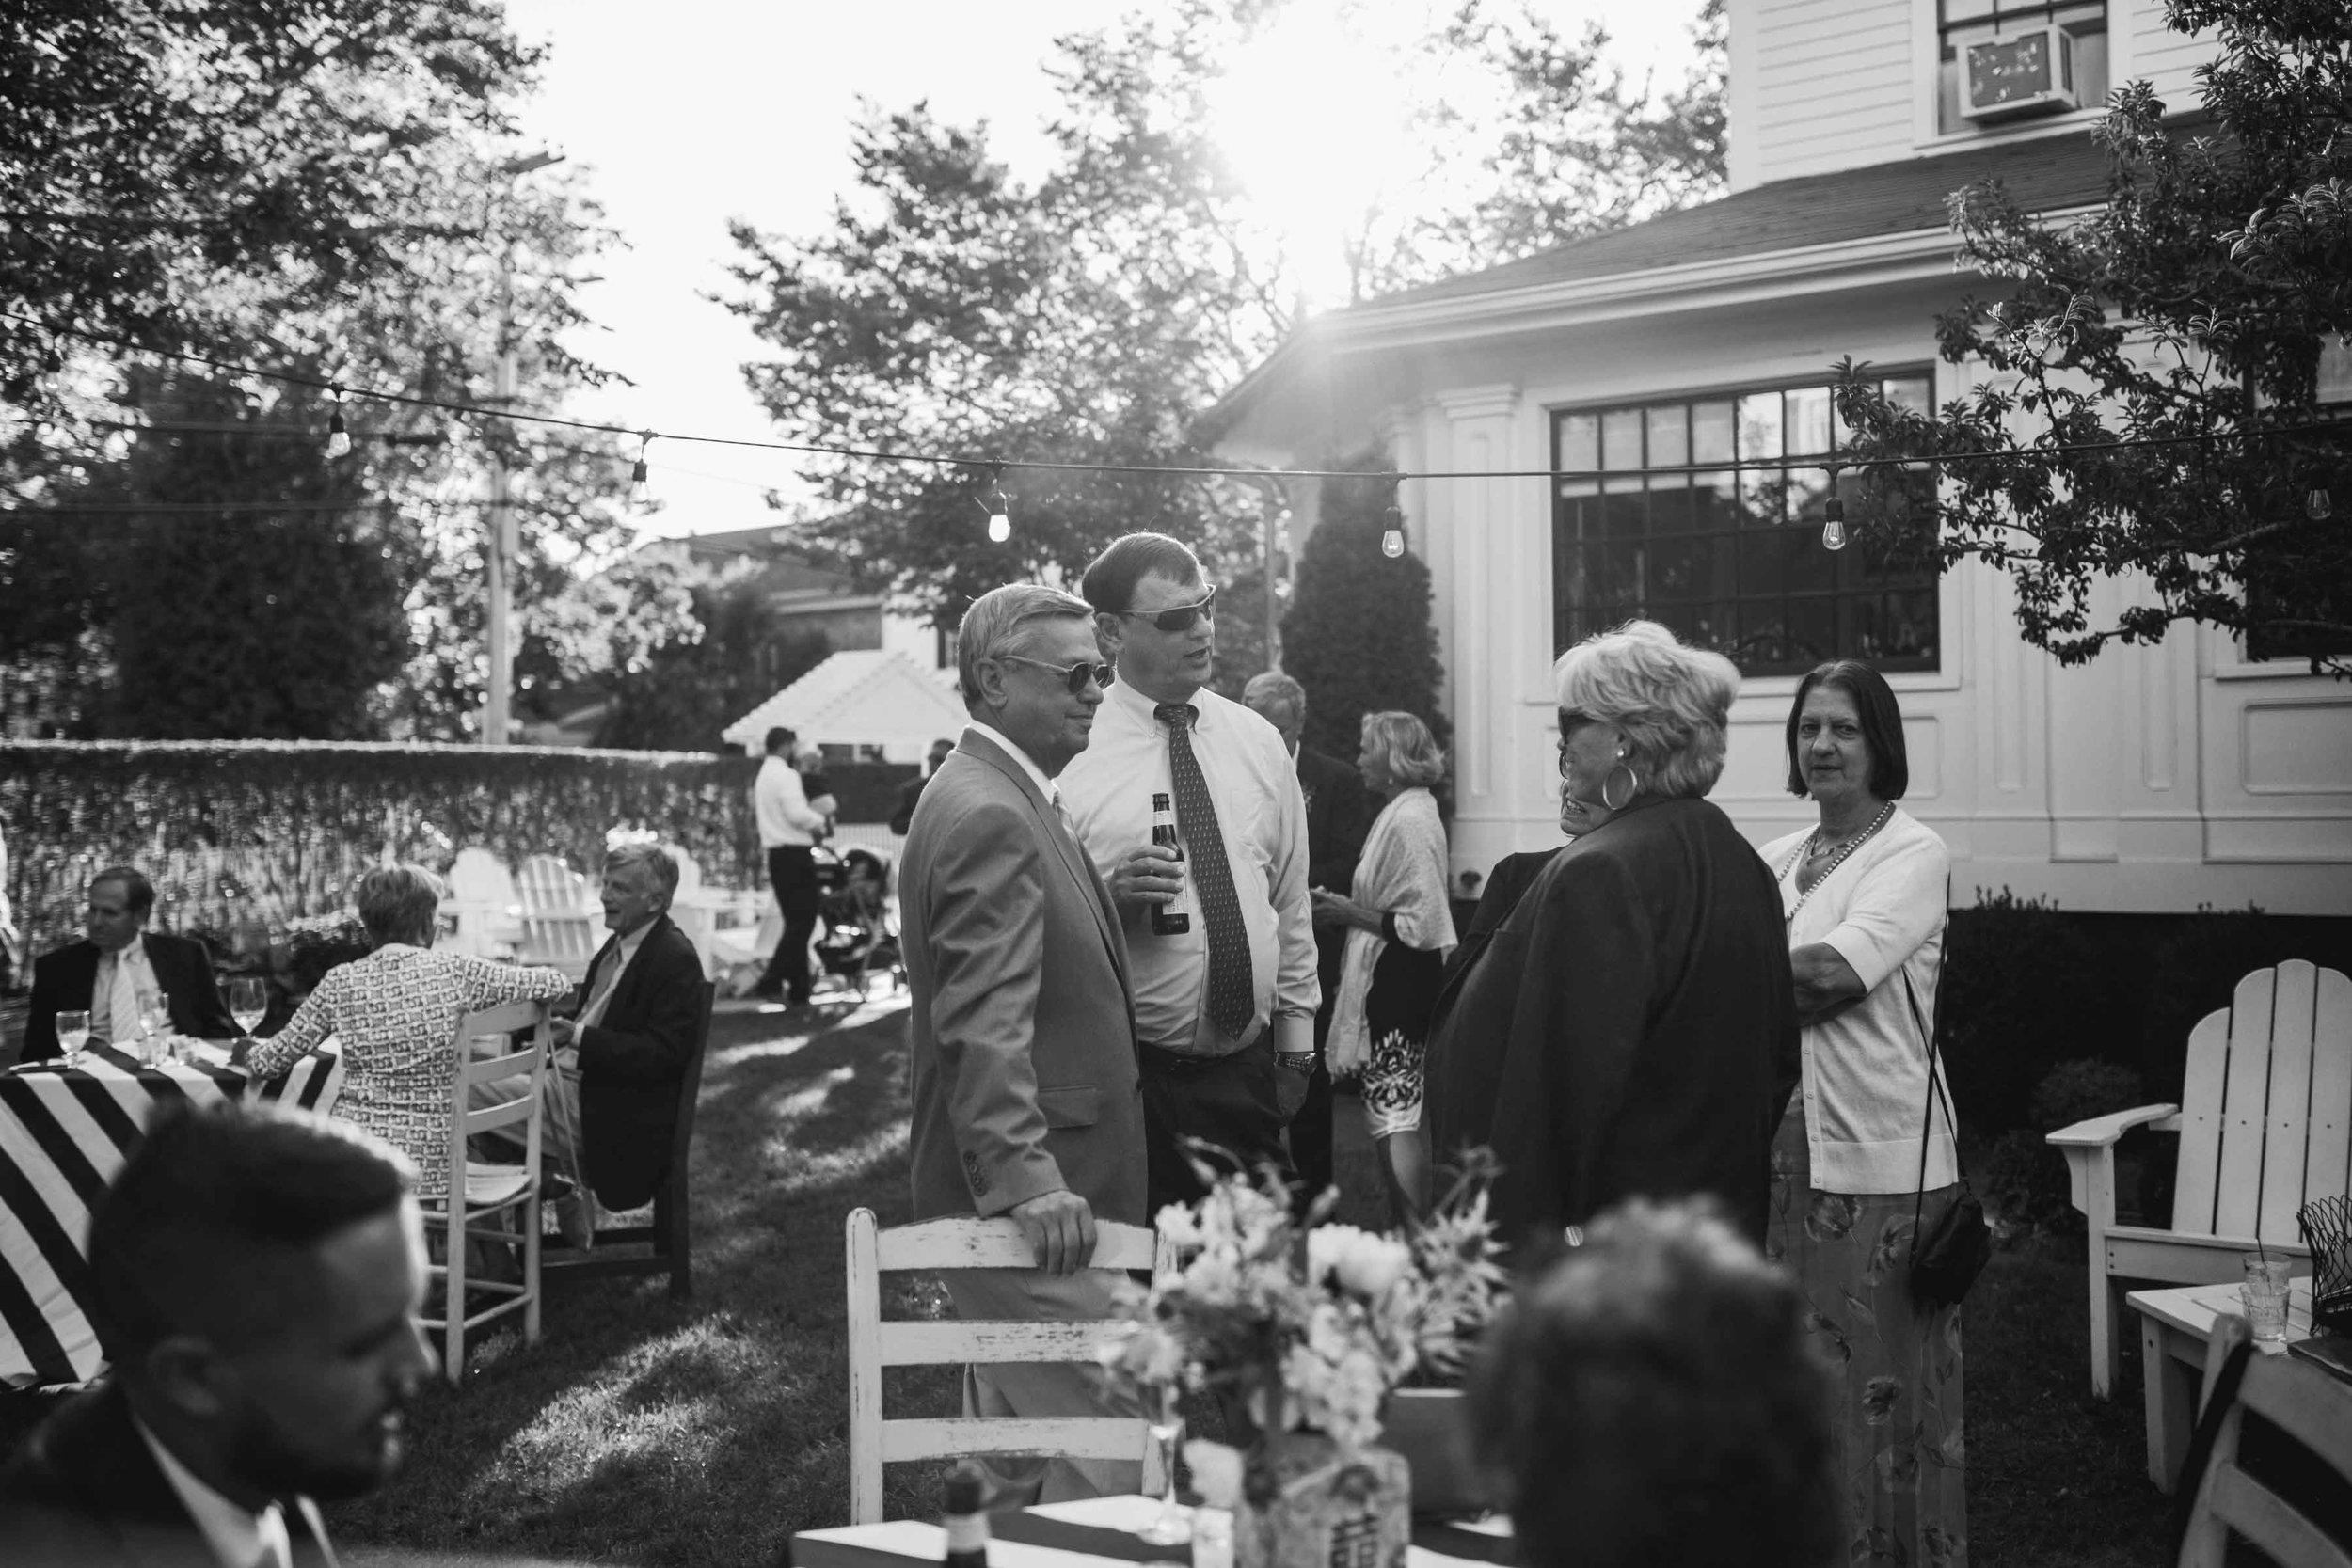 Marthas-vineyard-wedding-52.jpg